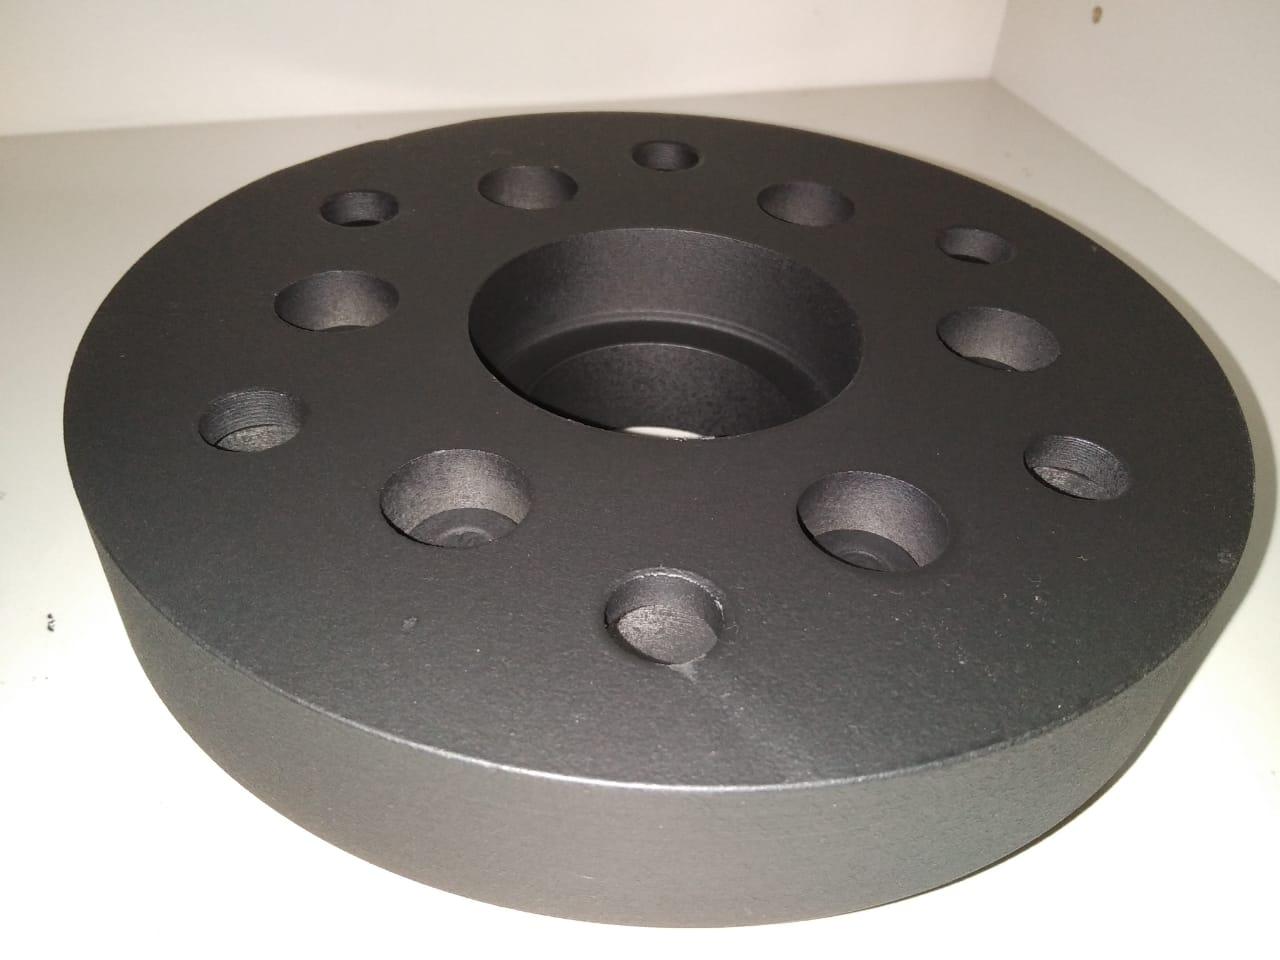 04 Espaçador/alargador Roda Dakota Frontier 6x114,3 50mm